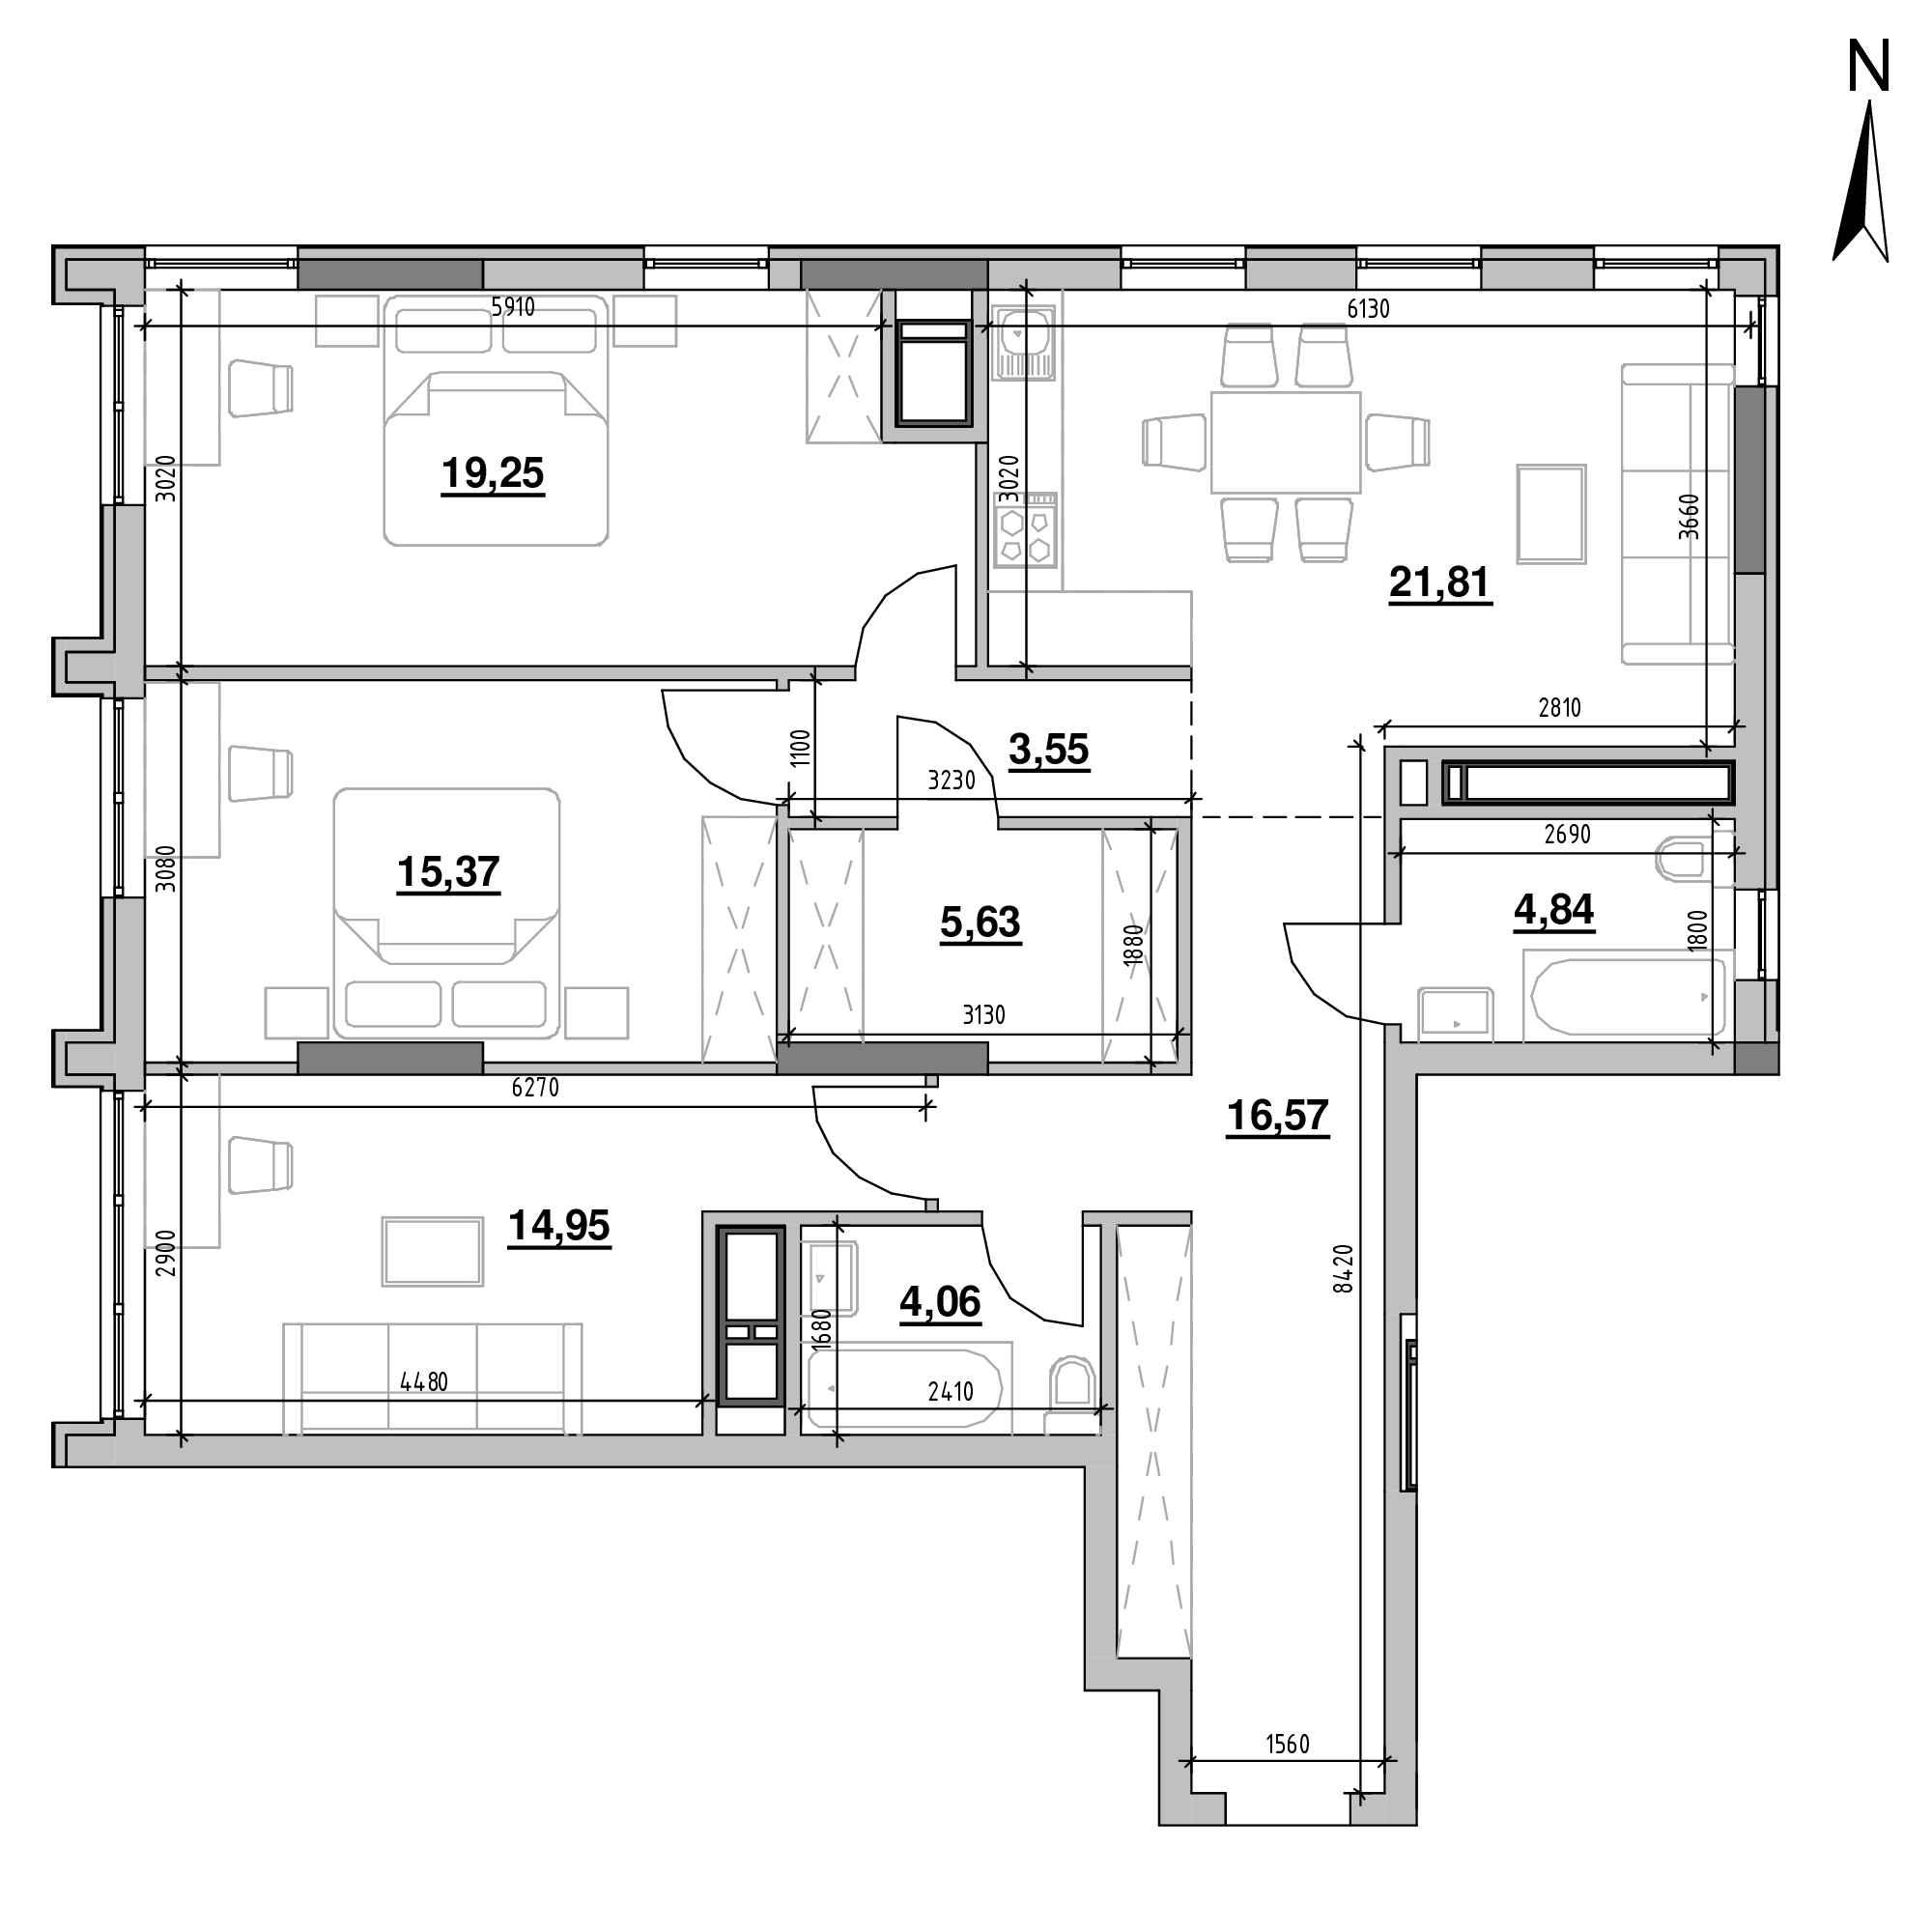 ЖК Nordica Residence: планування 1-кімнатної квартири, №205, 40.97 м<sup>2</sup>